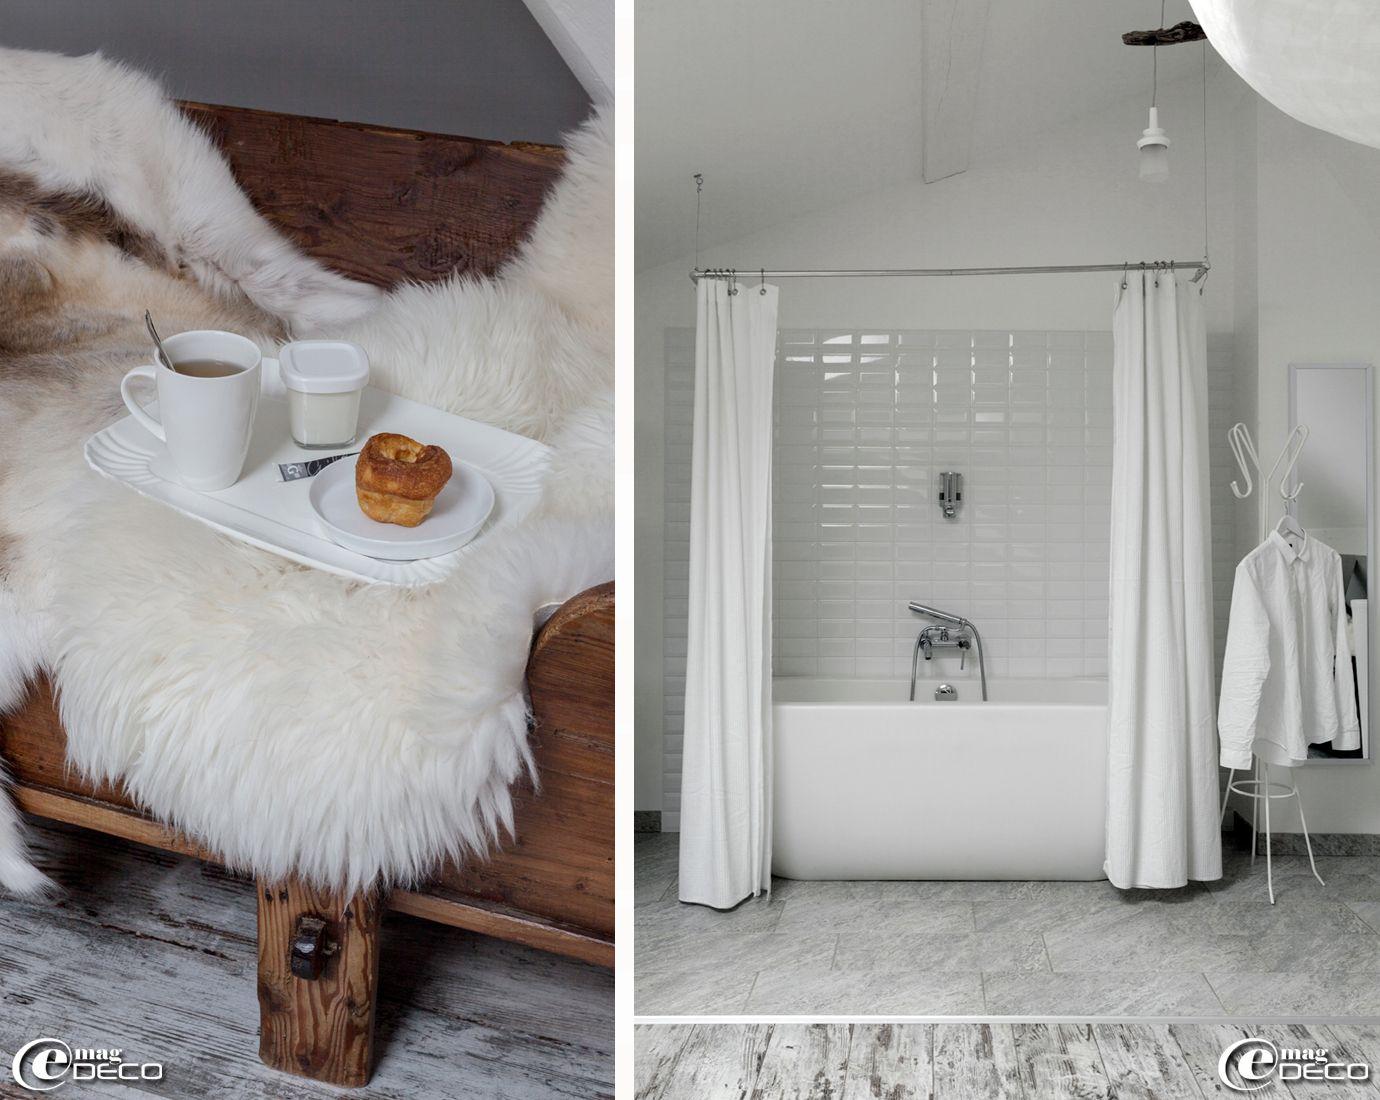 baignoire lumineuse 39 castorama 39 rideaux de douche 39 fly. Black Bedroom Furniture Sets. Home Design Ideas